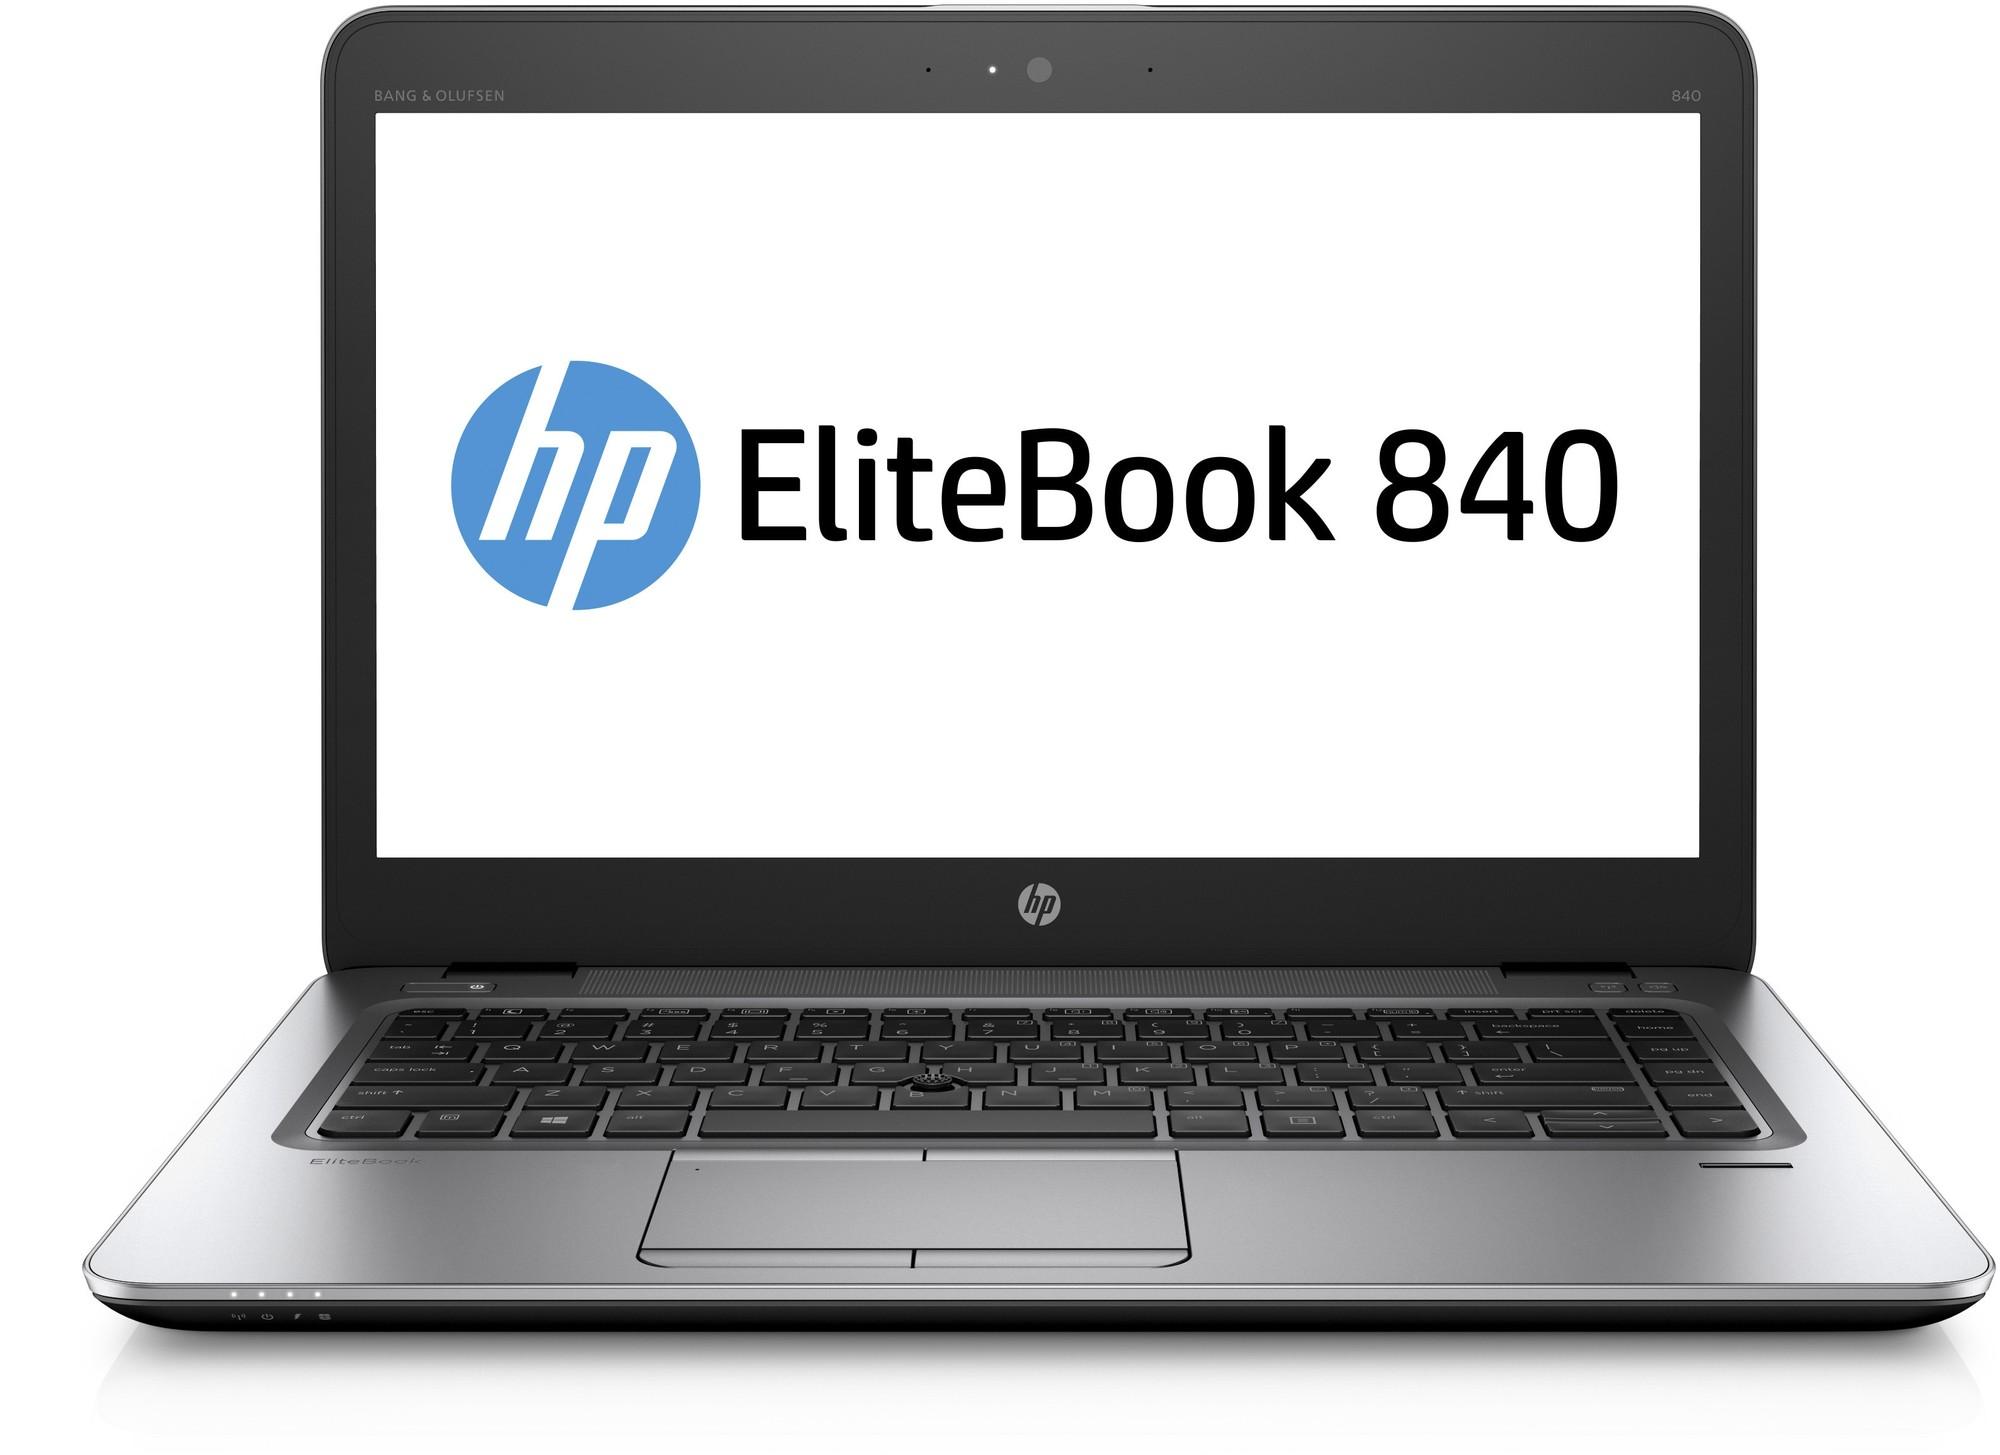 HP Elitebook 840 G4 - Intel Core i5-7300U - 16GB DDR4 - 500GB SSD - HDMI - C-Grade